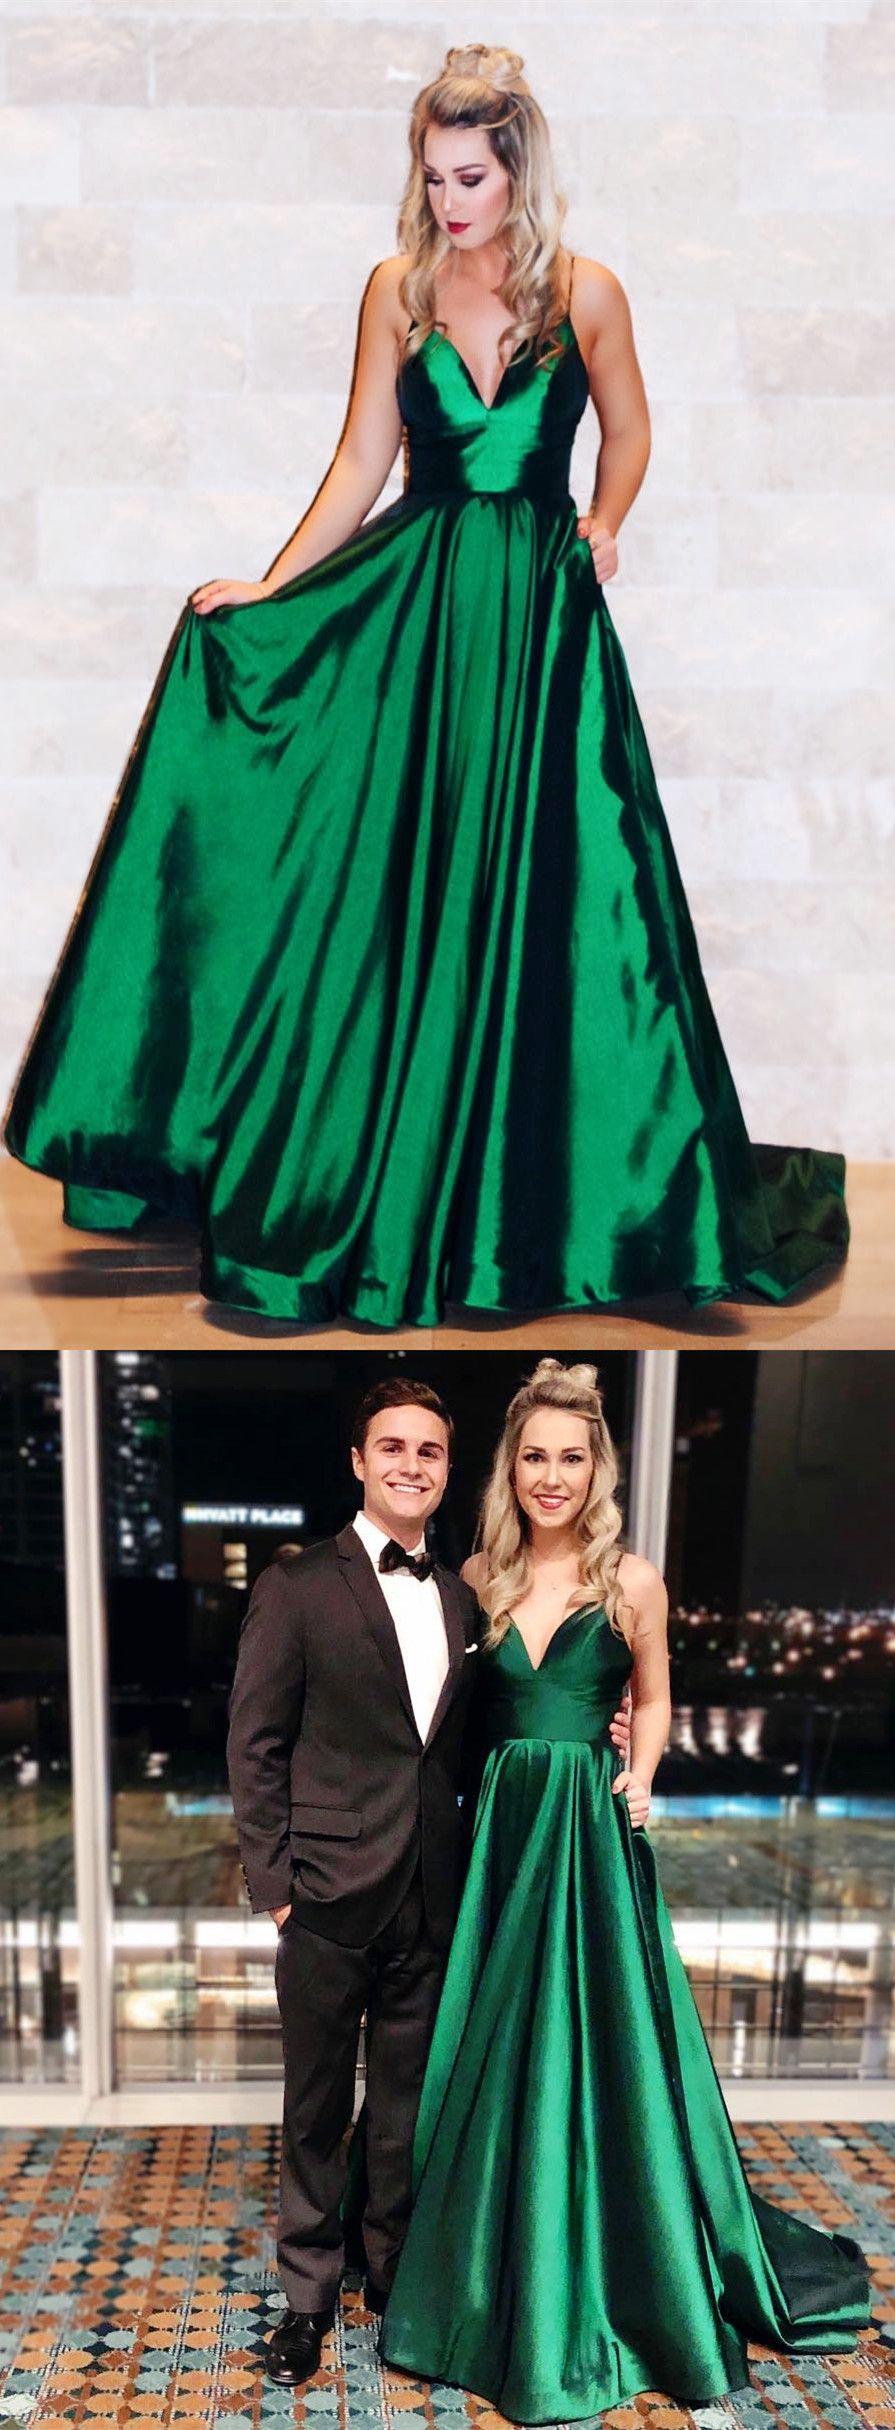 Gorgeous green prom dress   prom dress long prom dress green prom dress straps long prom